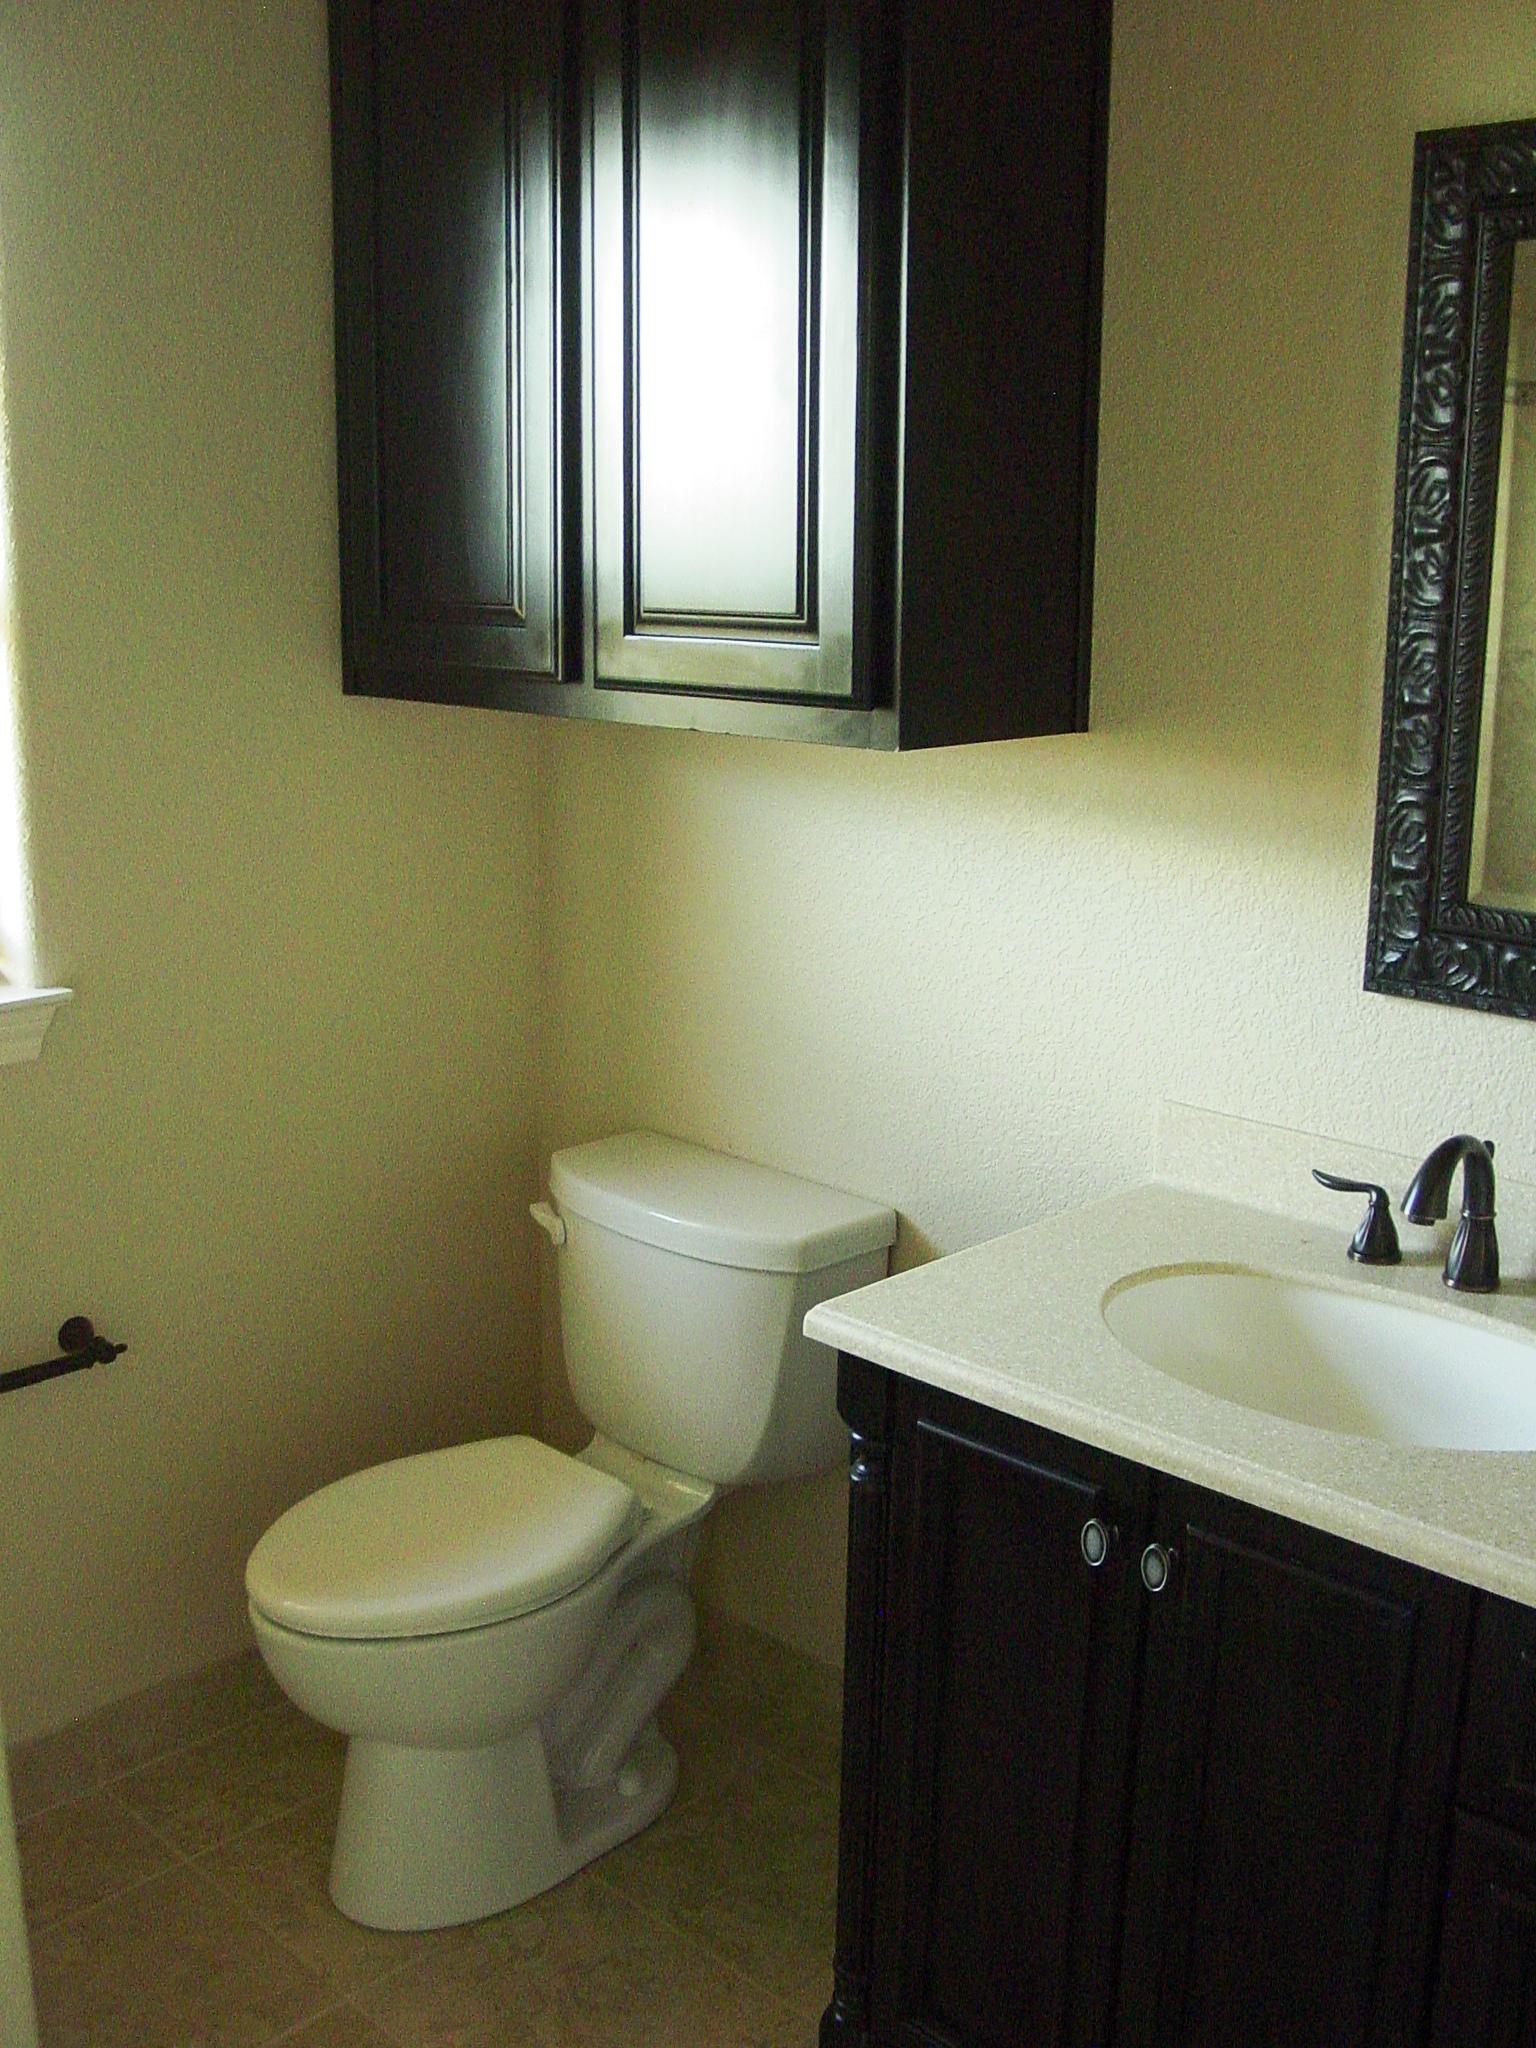 411 HH - Complete, Interior, Bath 2,1.JPG